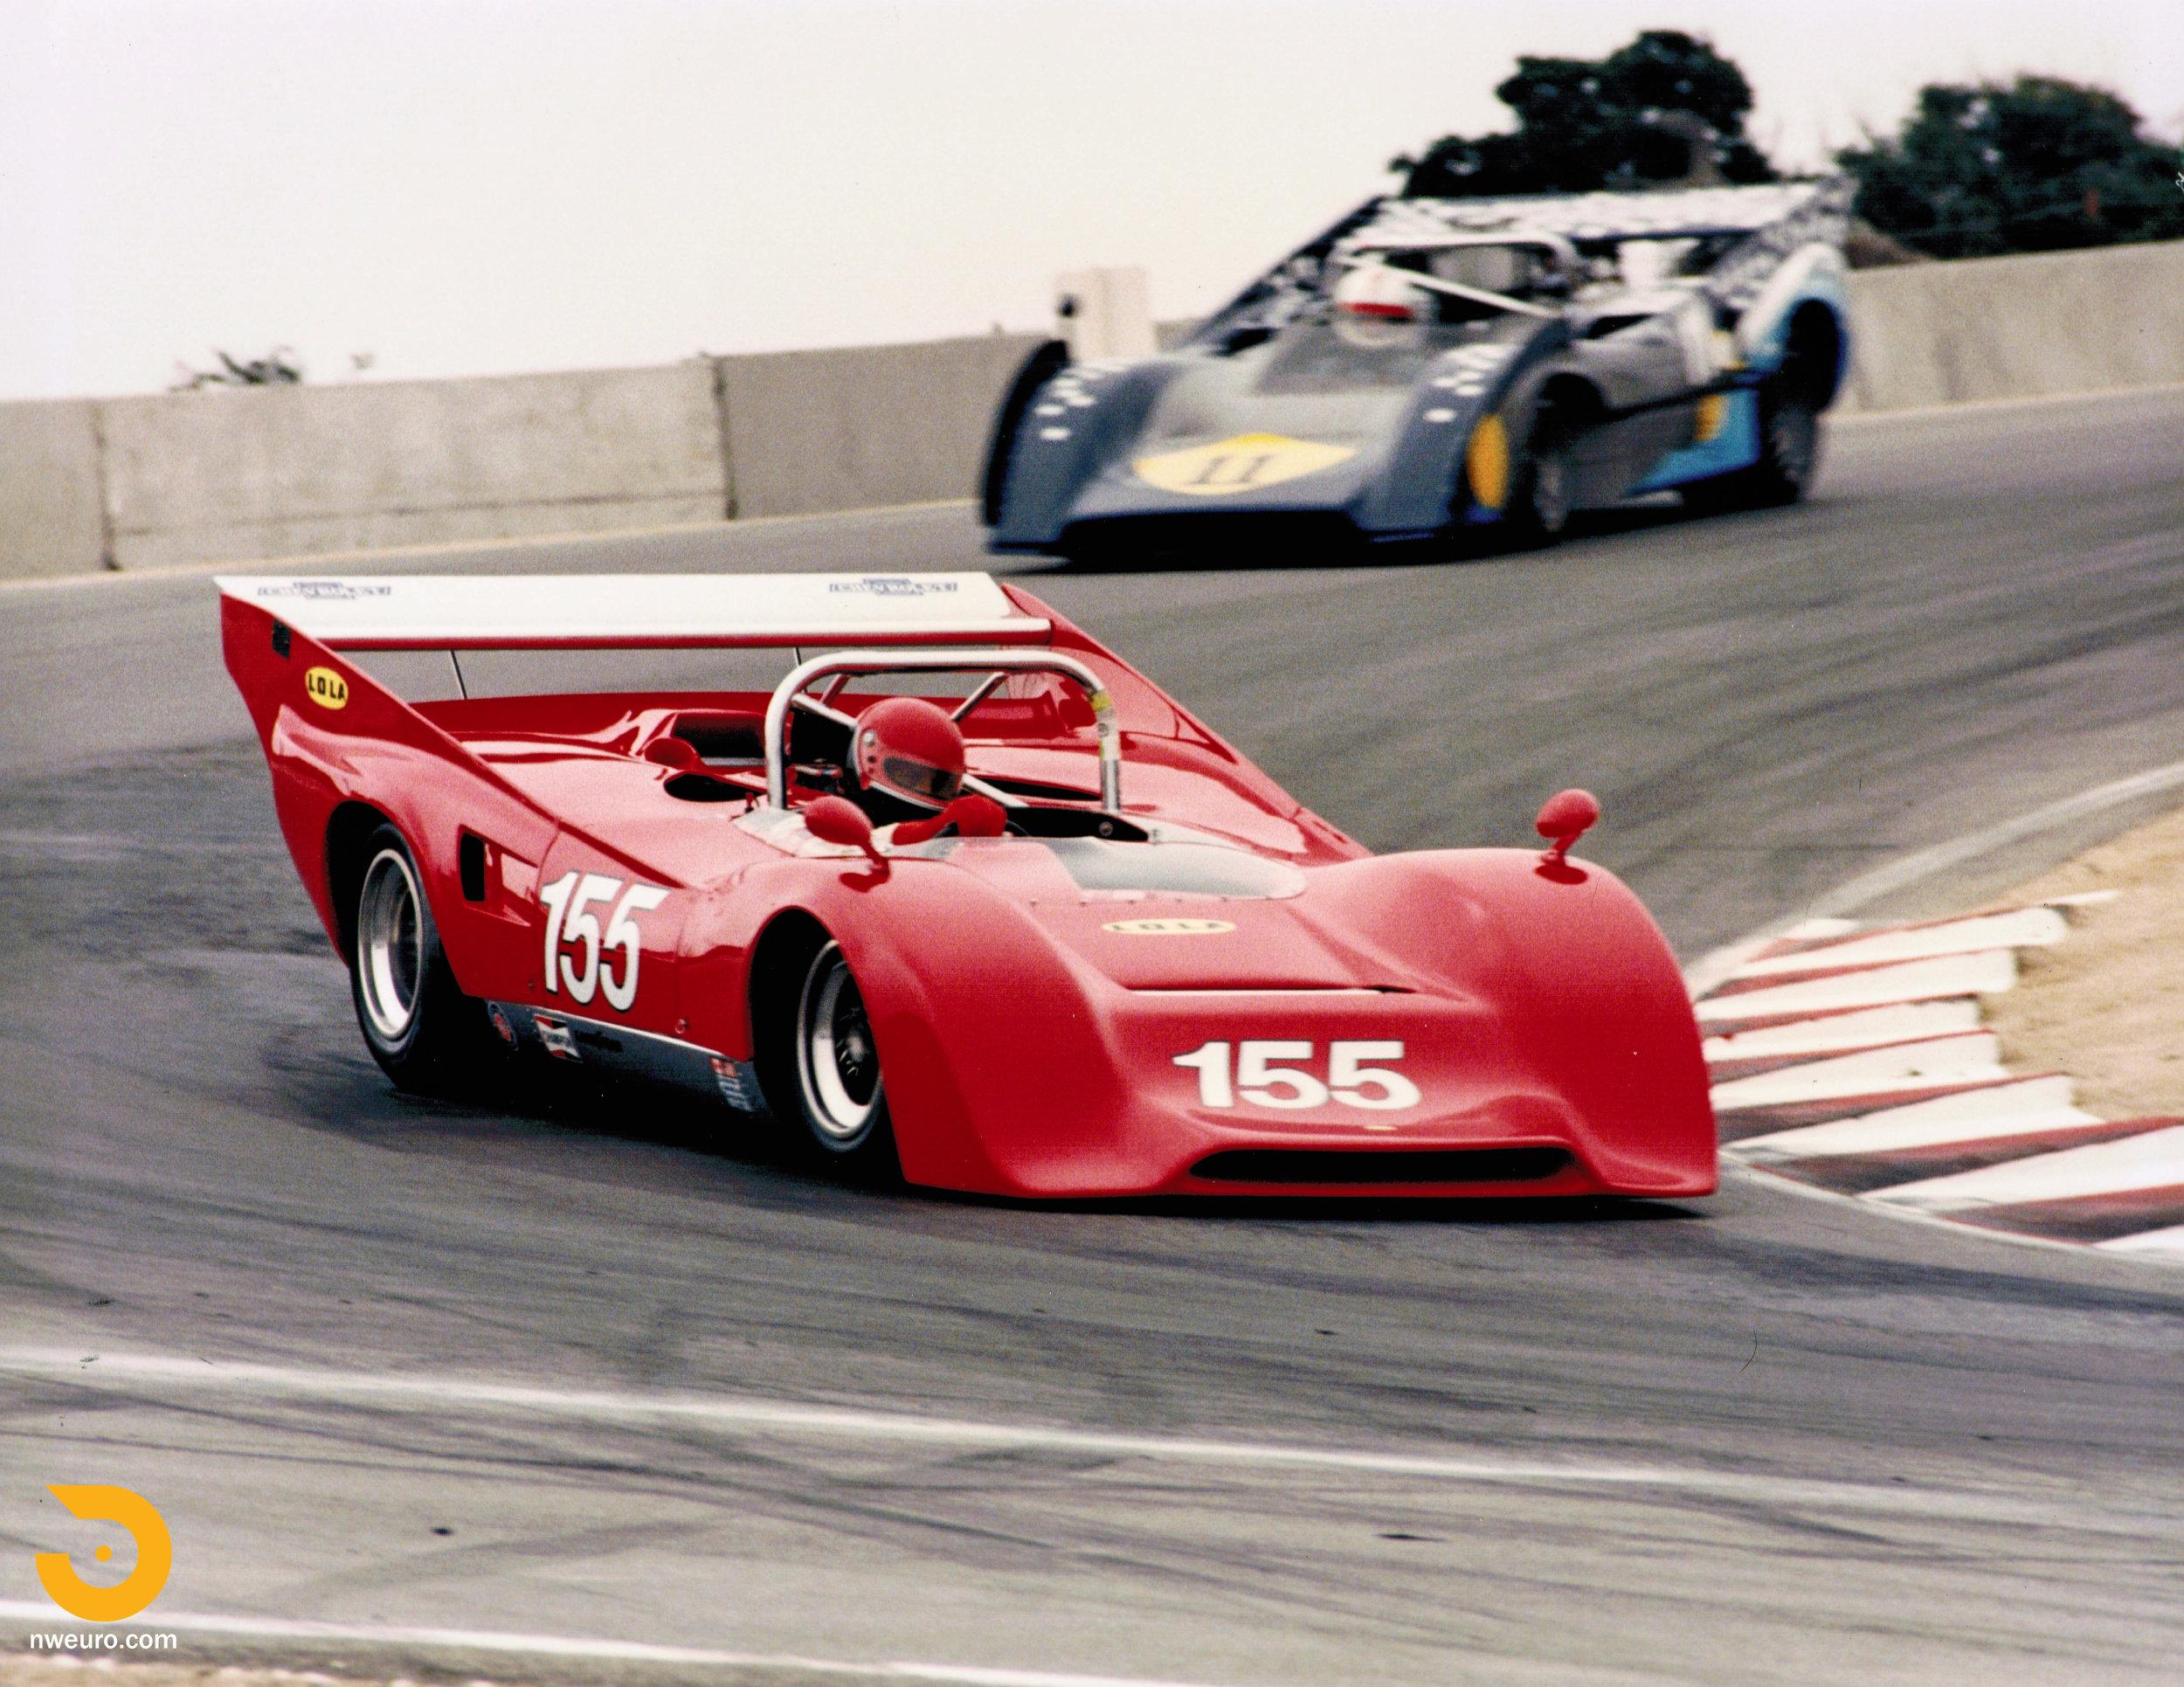 1969 Lola T162 Can-Am Race Car Action Shots-10.jpg